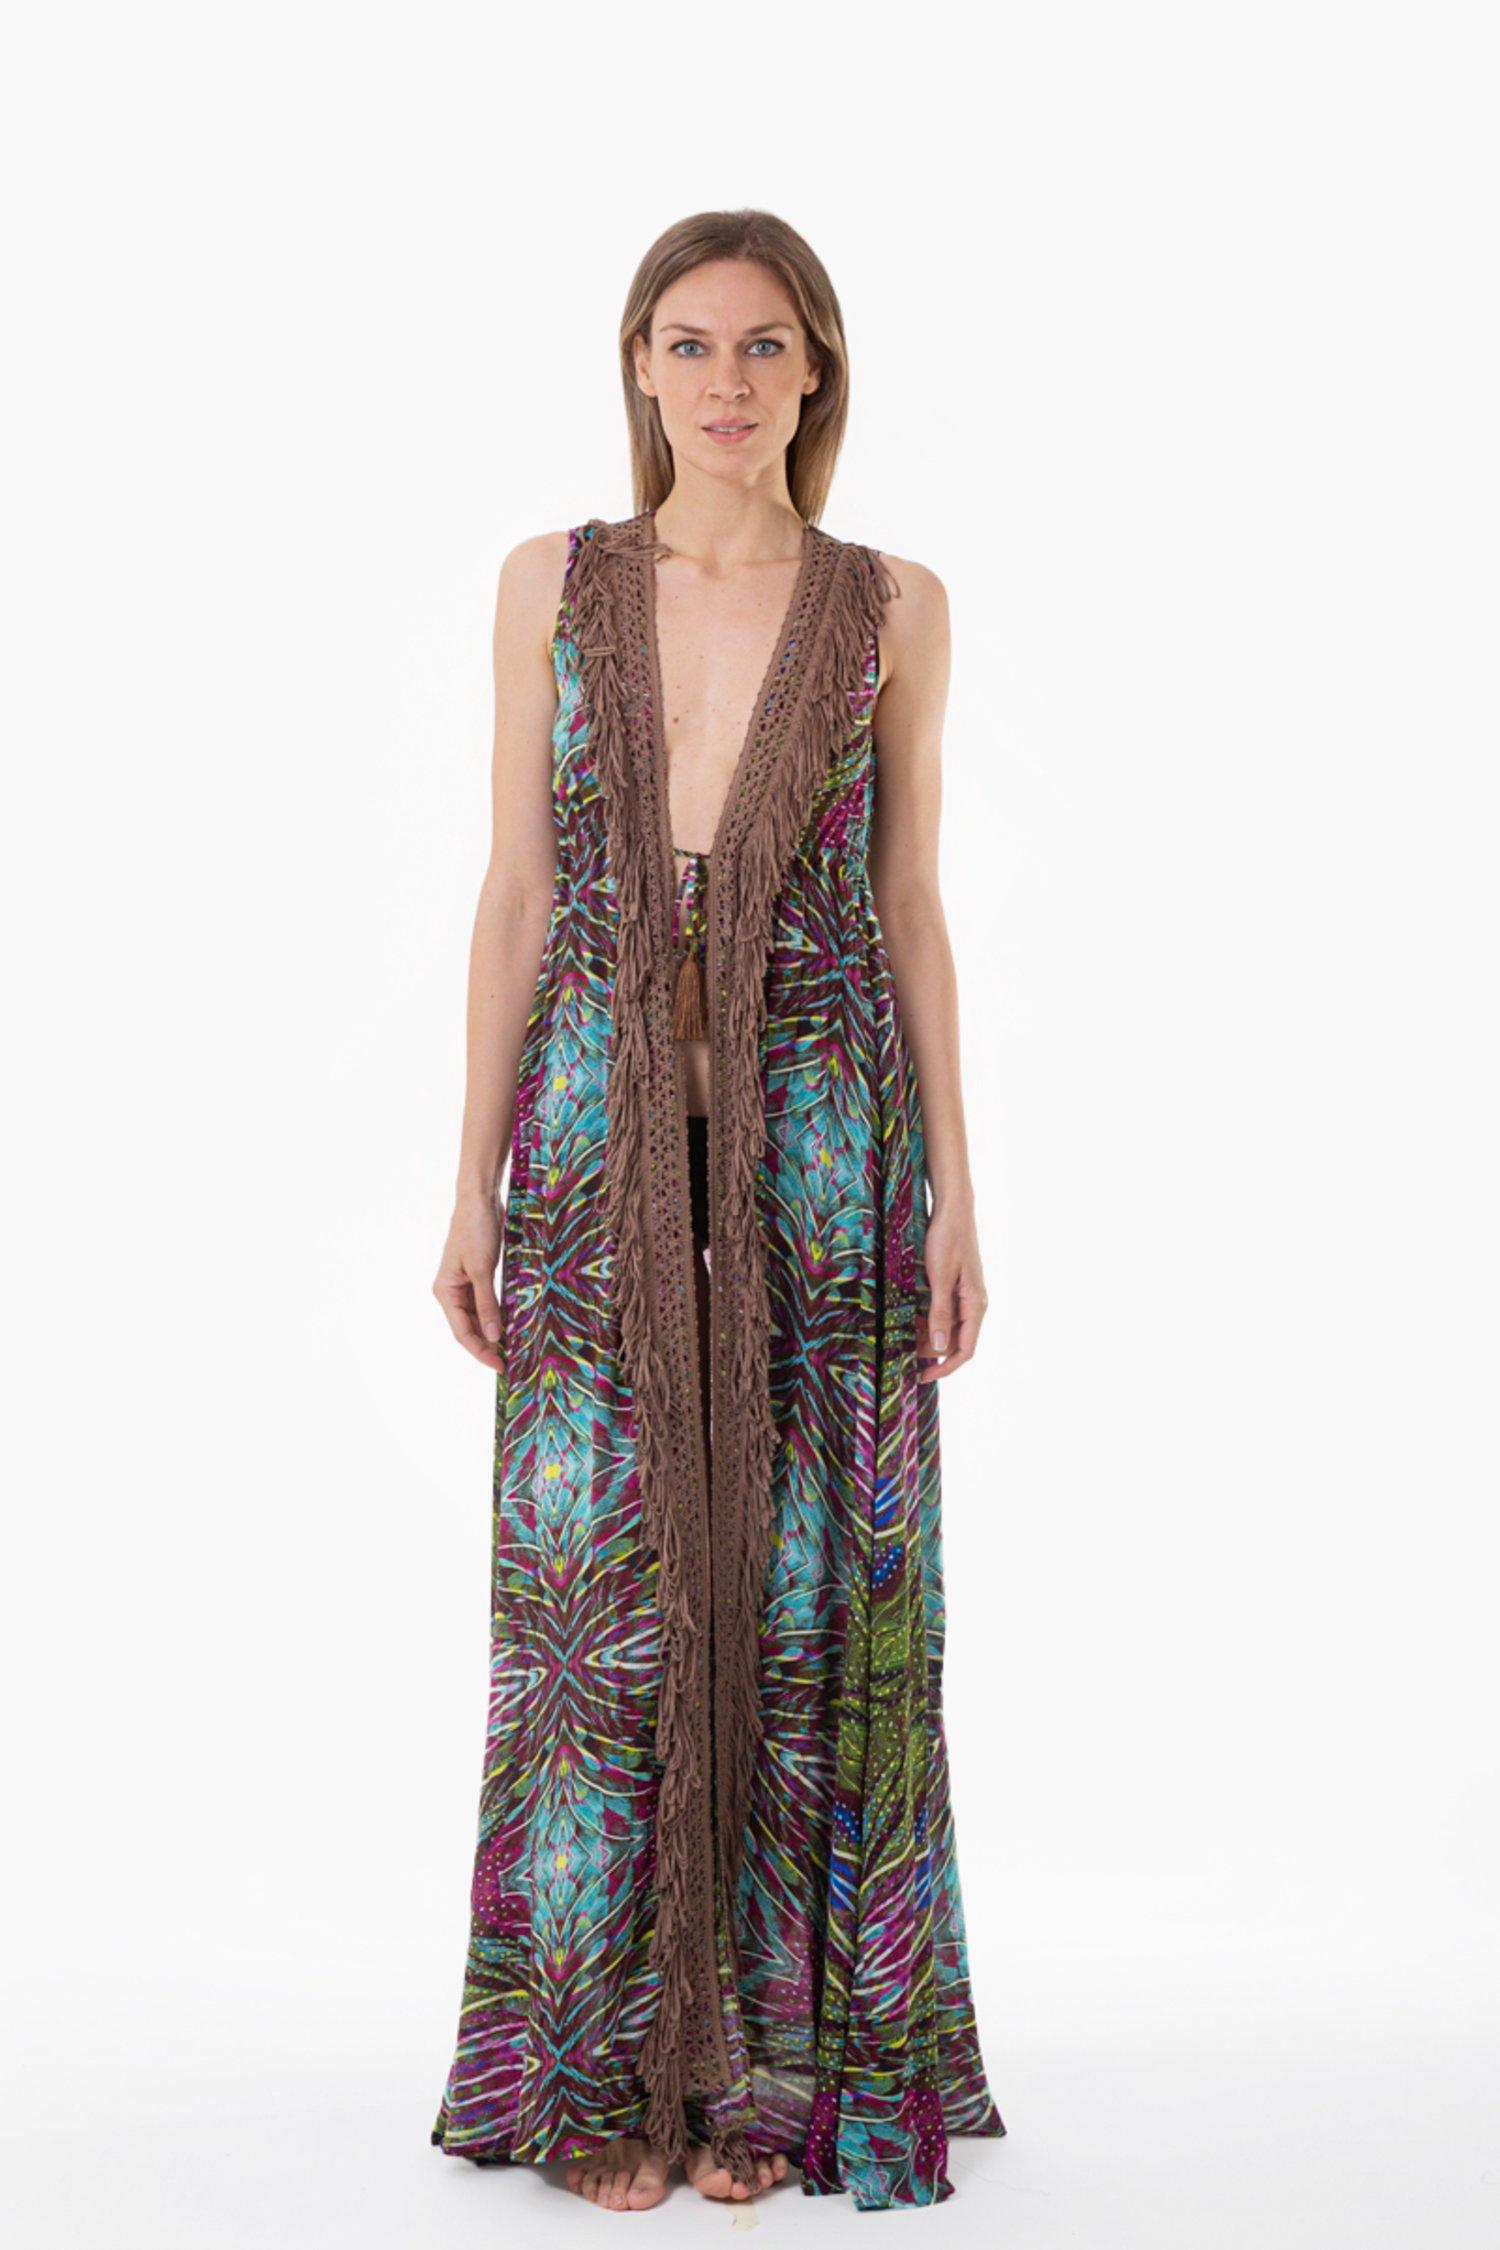 LONG DRESS WITH FRINGES - Plumage Azzurro